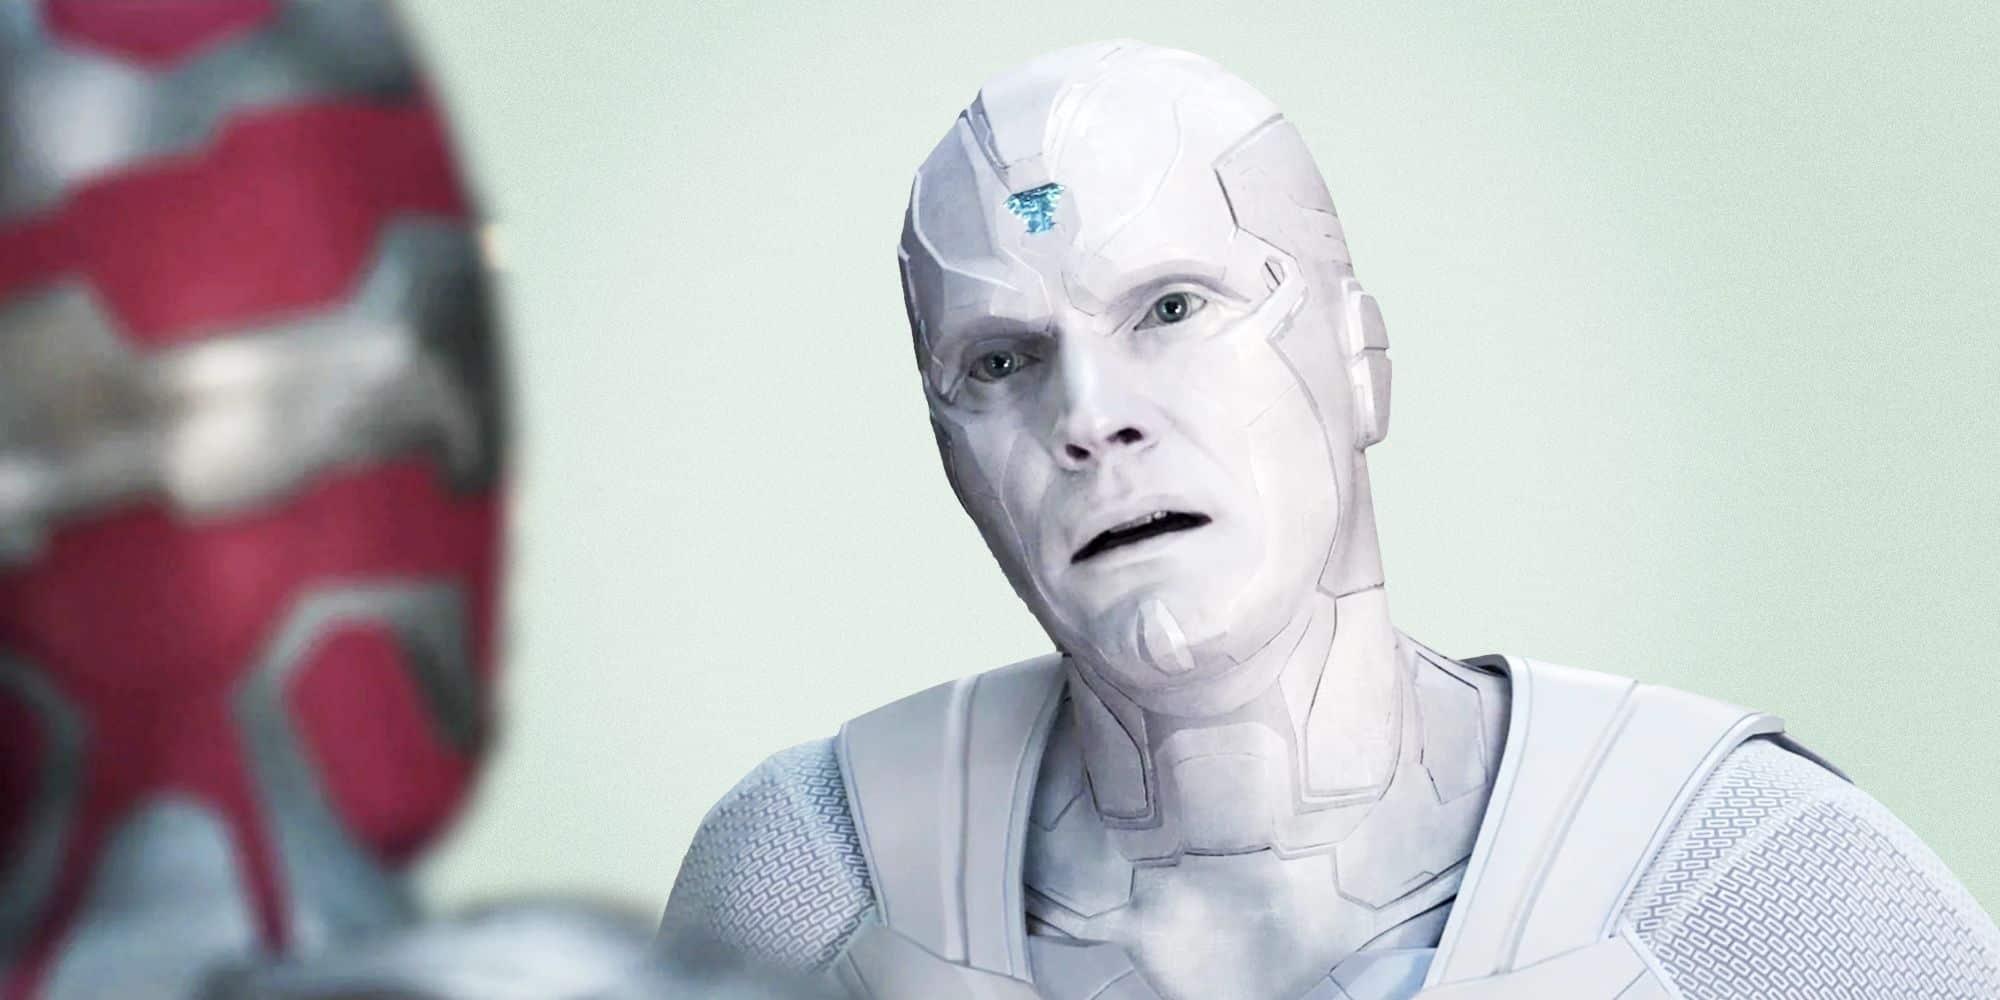 WandaVision death of ambiguity film TV storytelling Marvel Cinematic Universe MCU